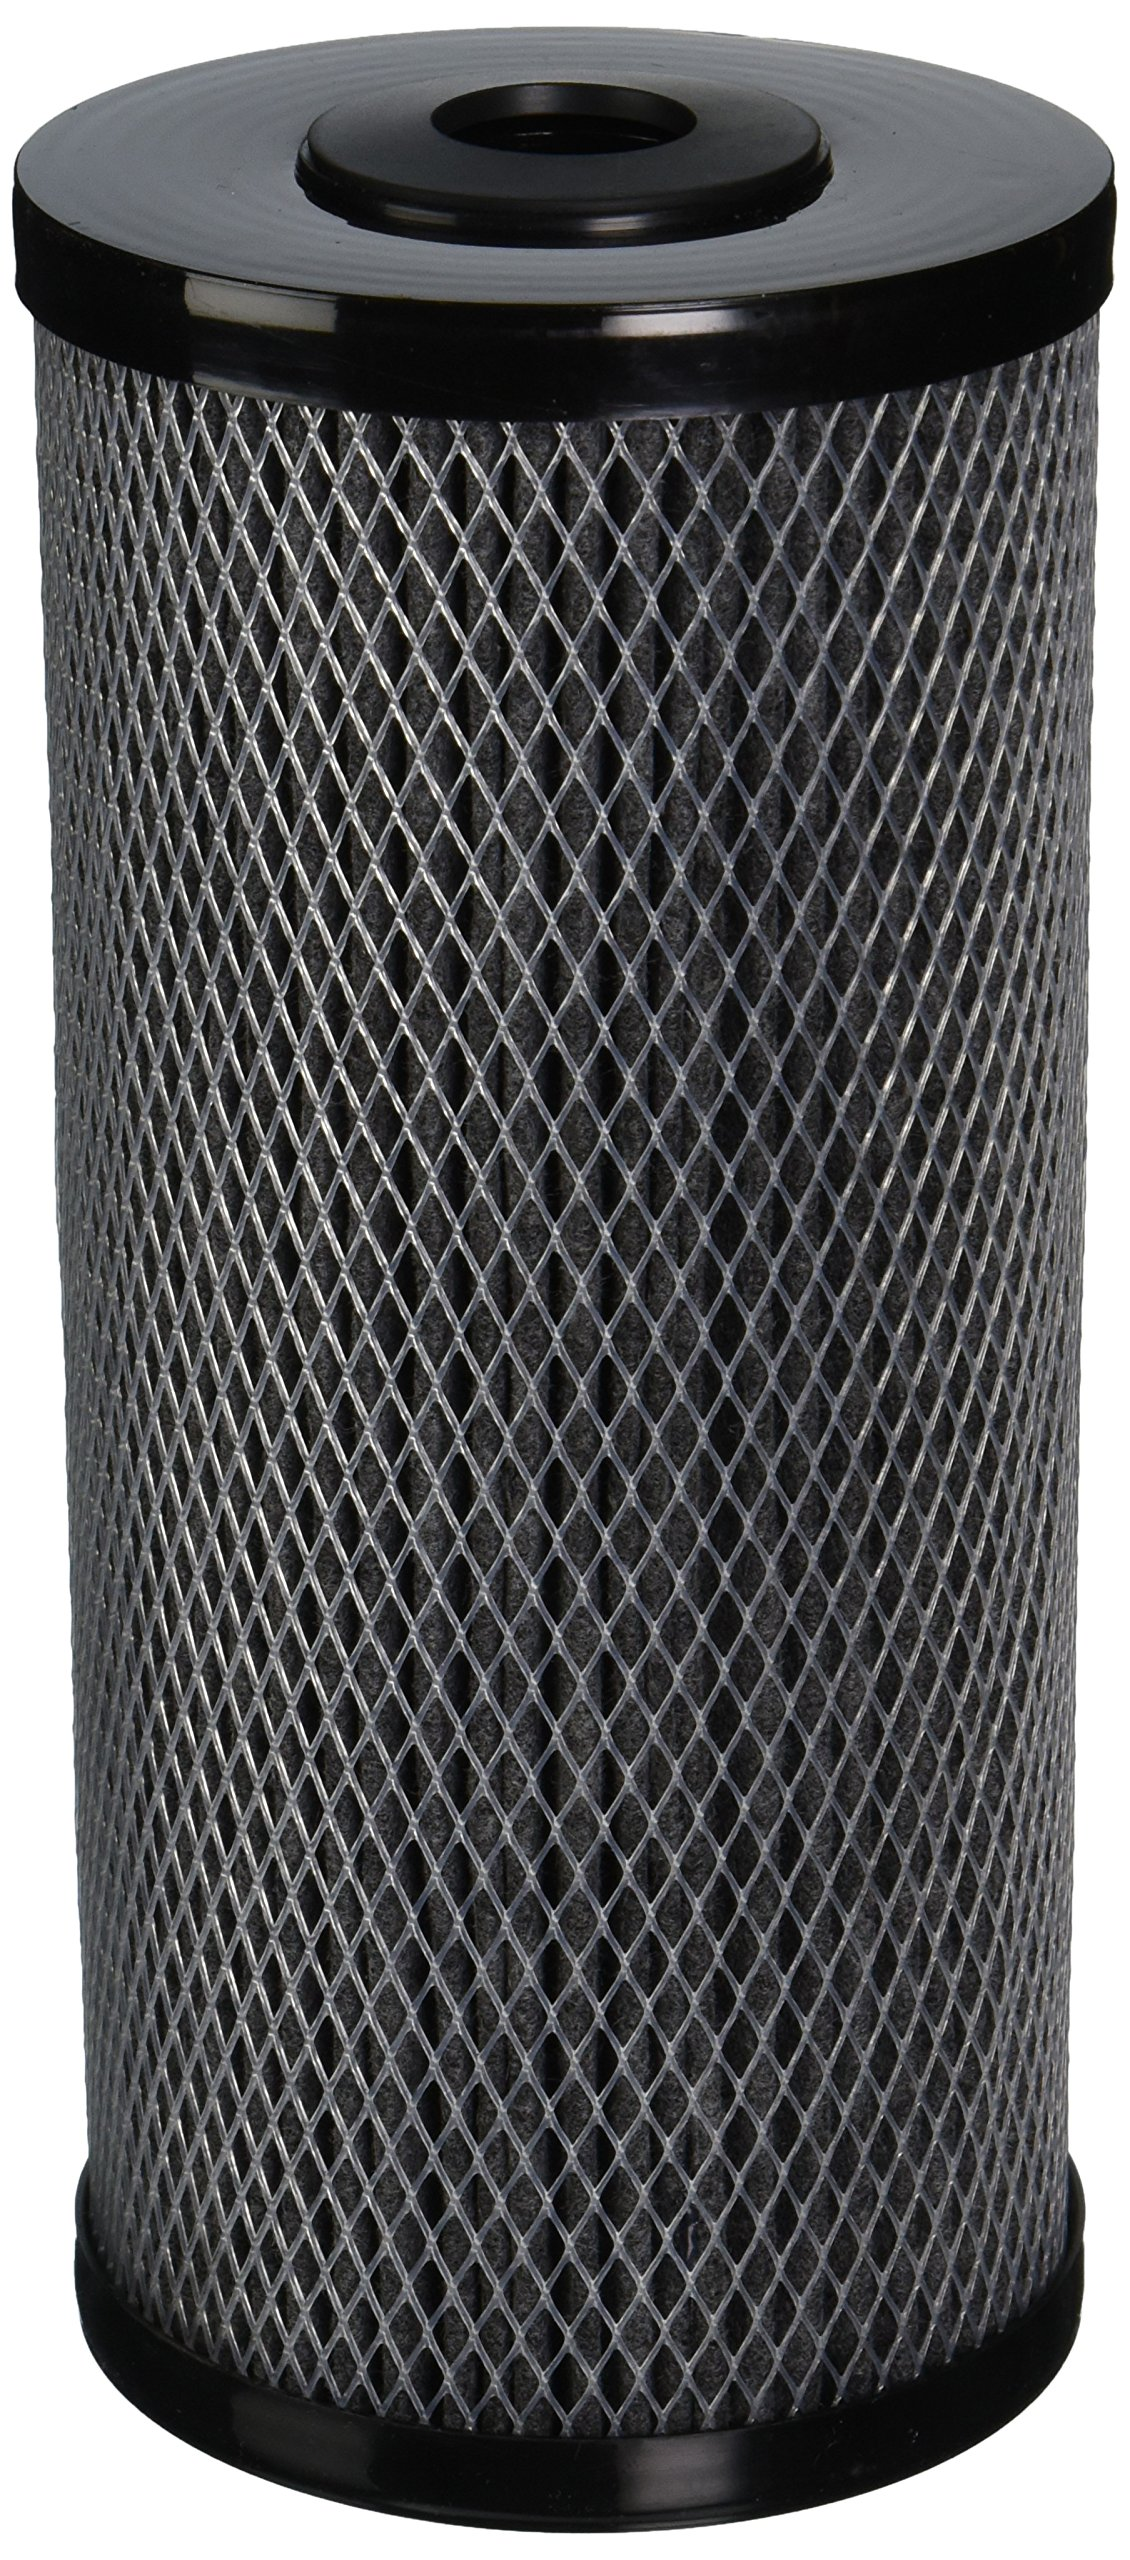 DuPont DUPONT-WFHDC8001 Universal Heavy Duty House Carbon 2 Phase Cartridge